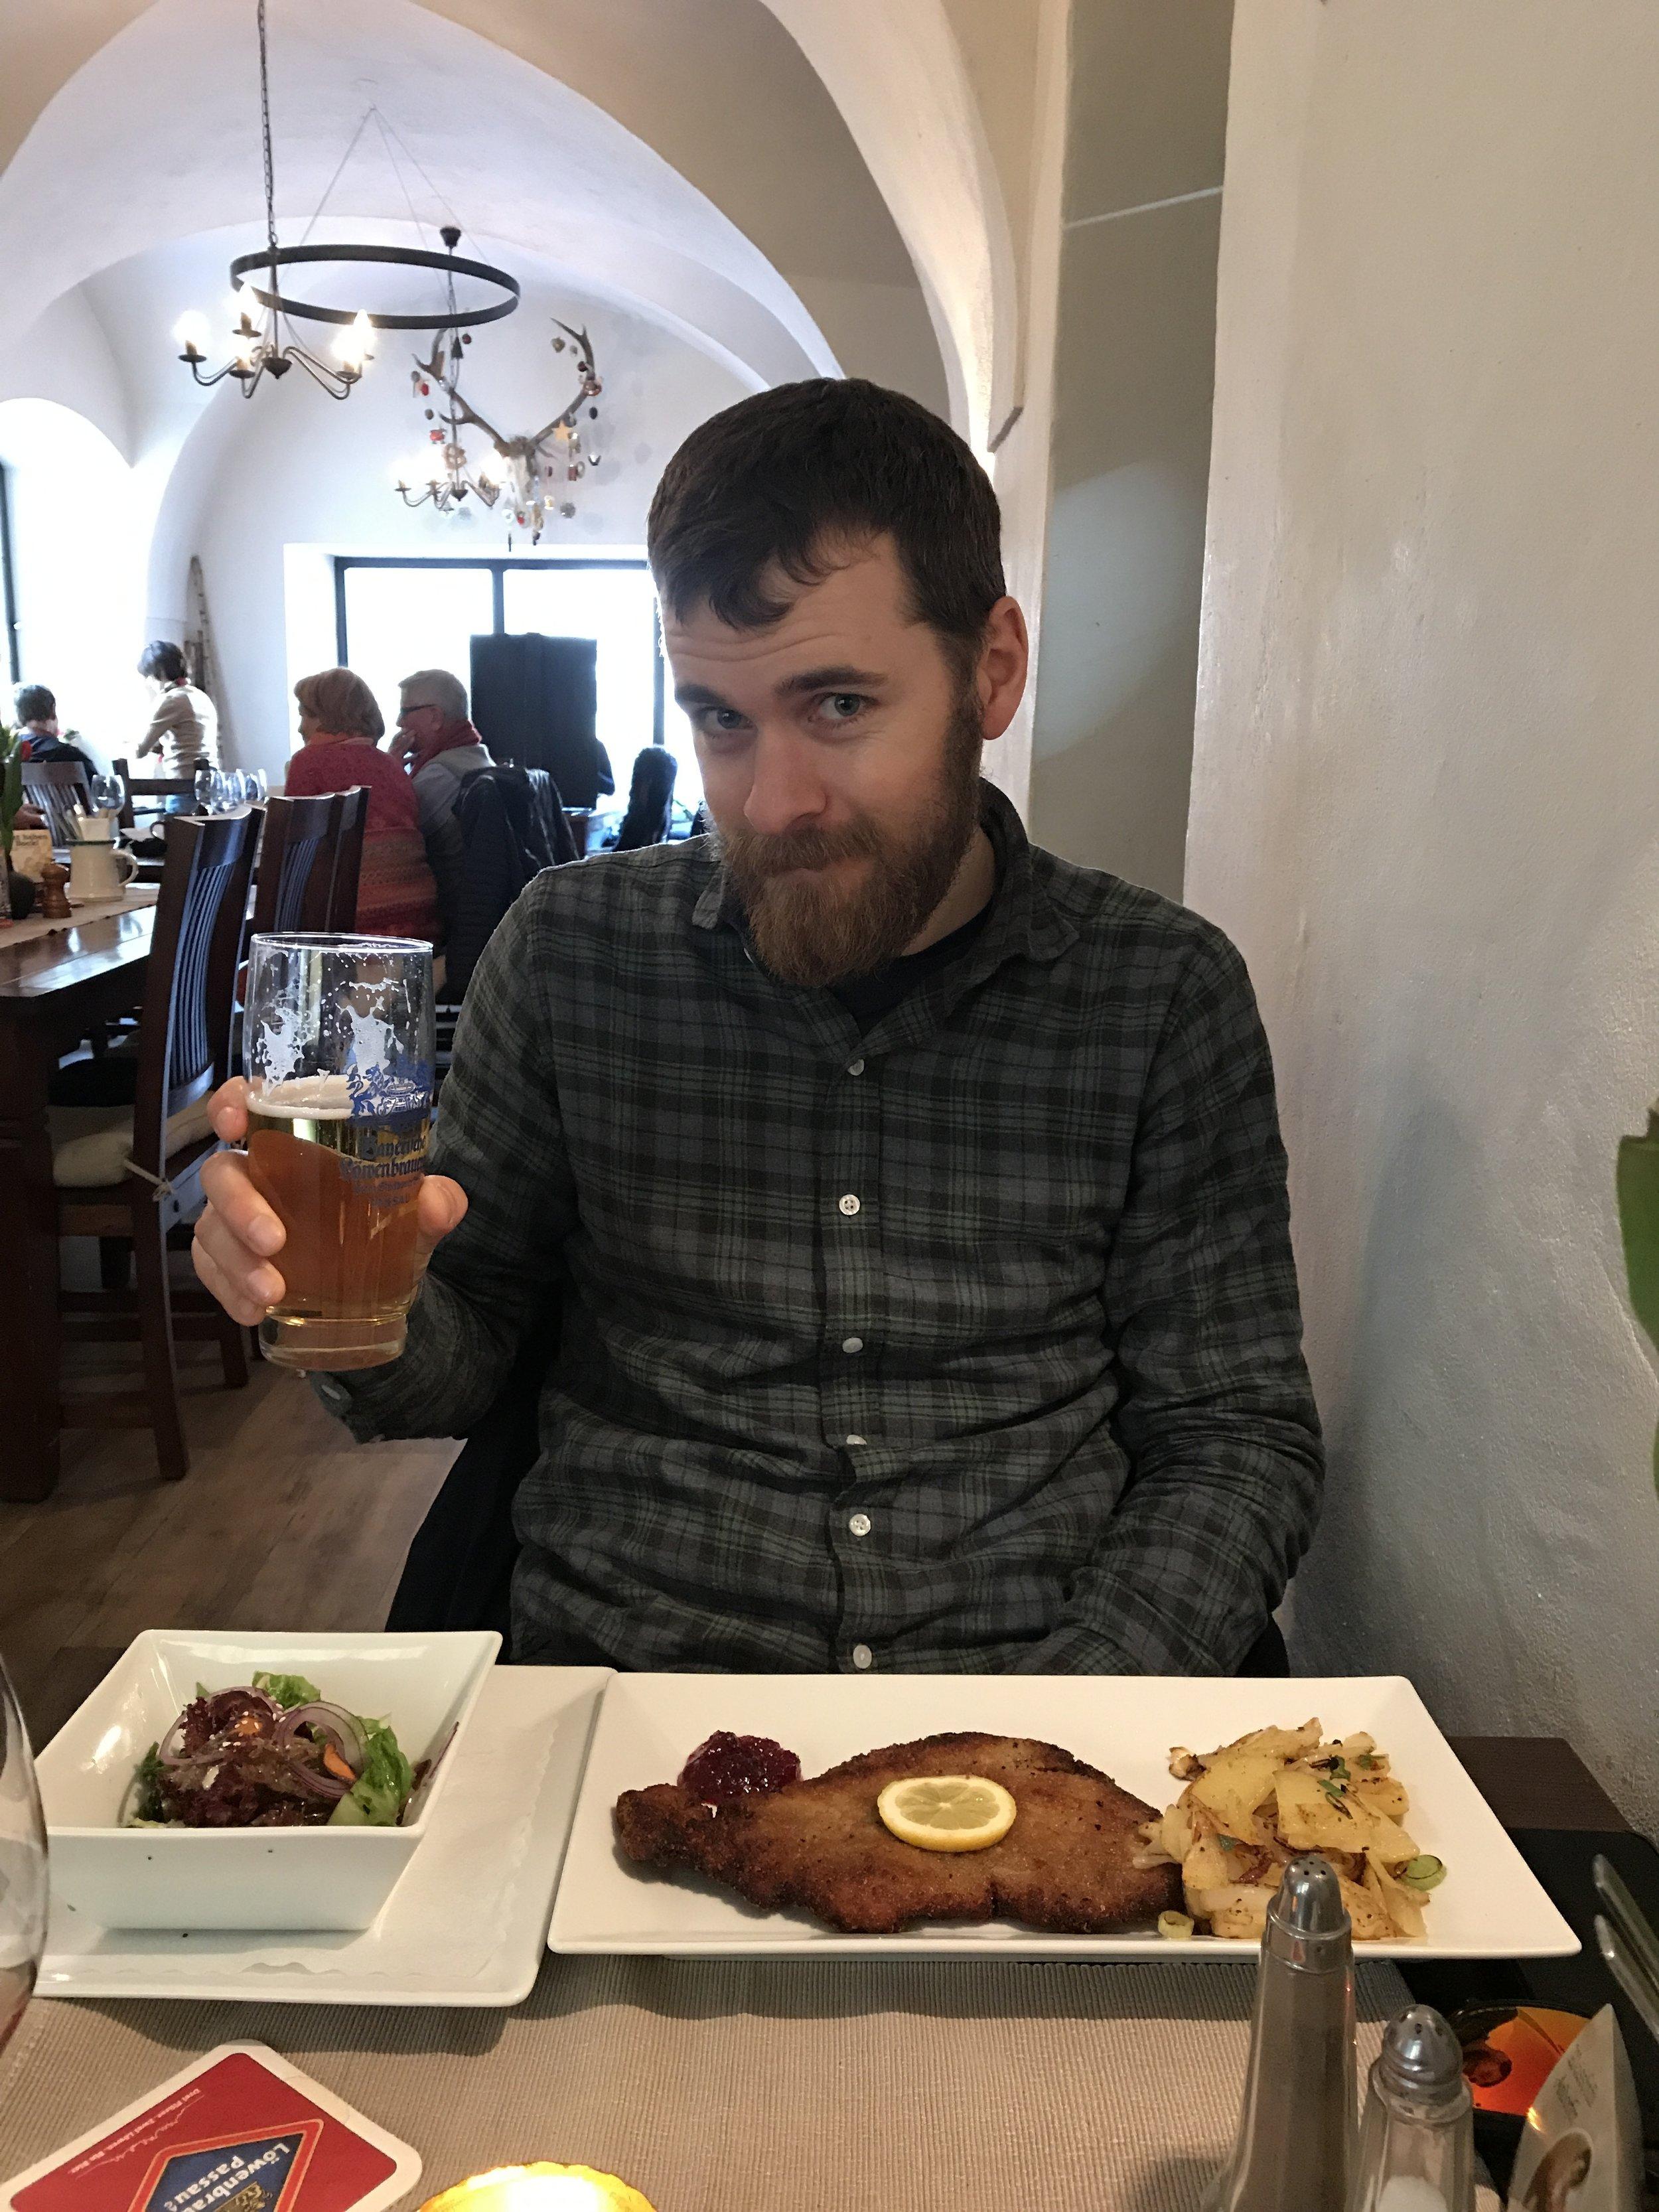 Traditional German fare in Passau